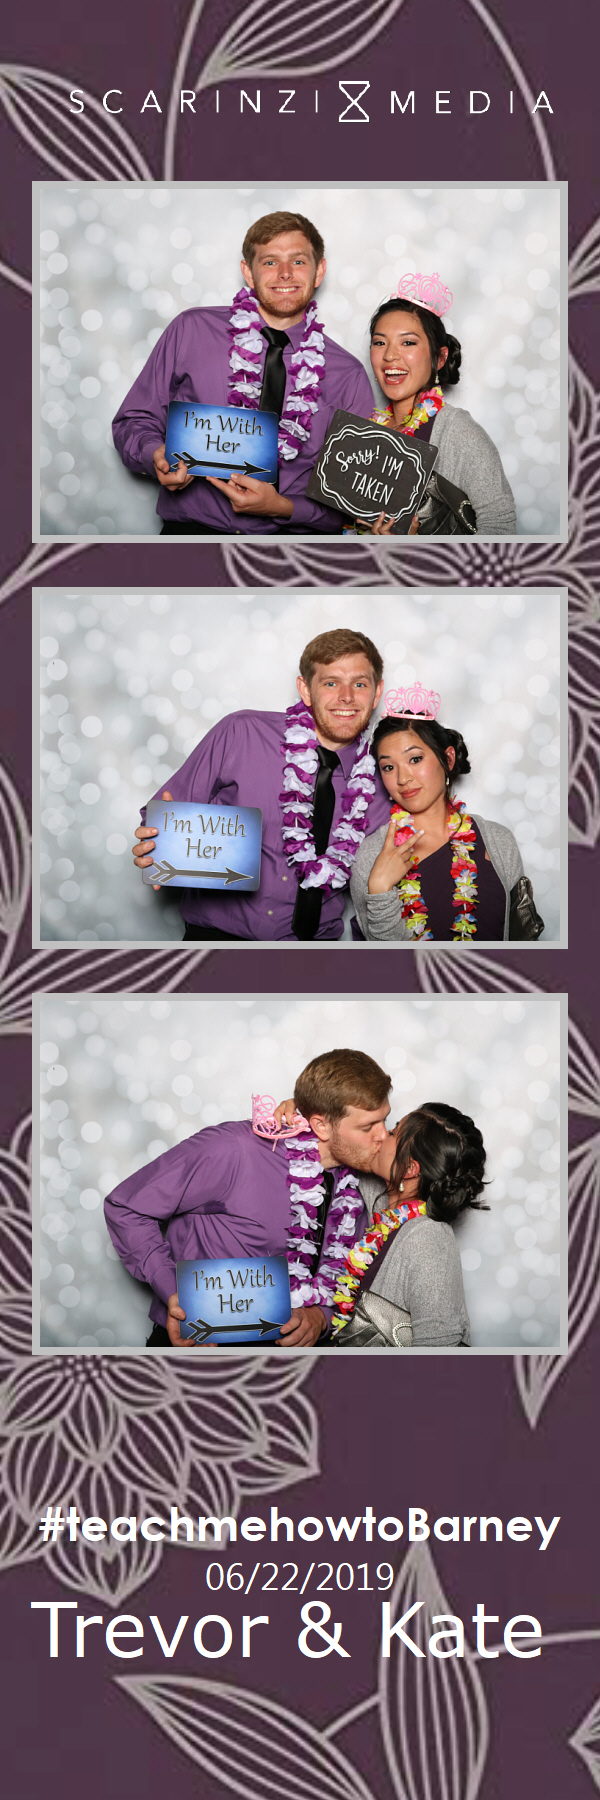 2019.06.22 - Barney Wedding PHOTOBOOTH52.jpg